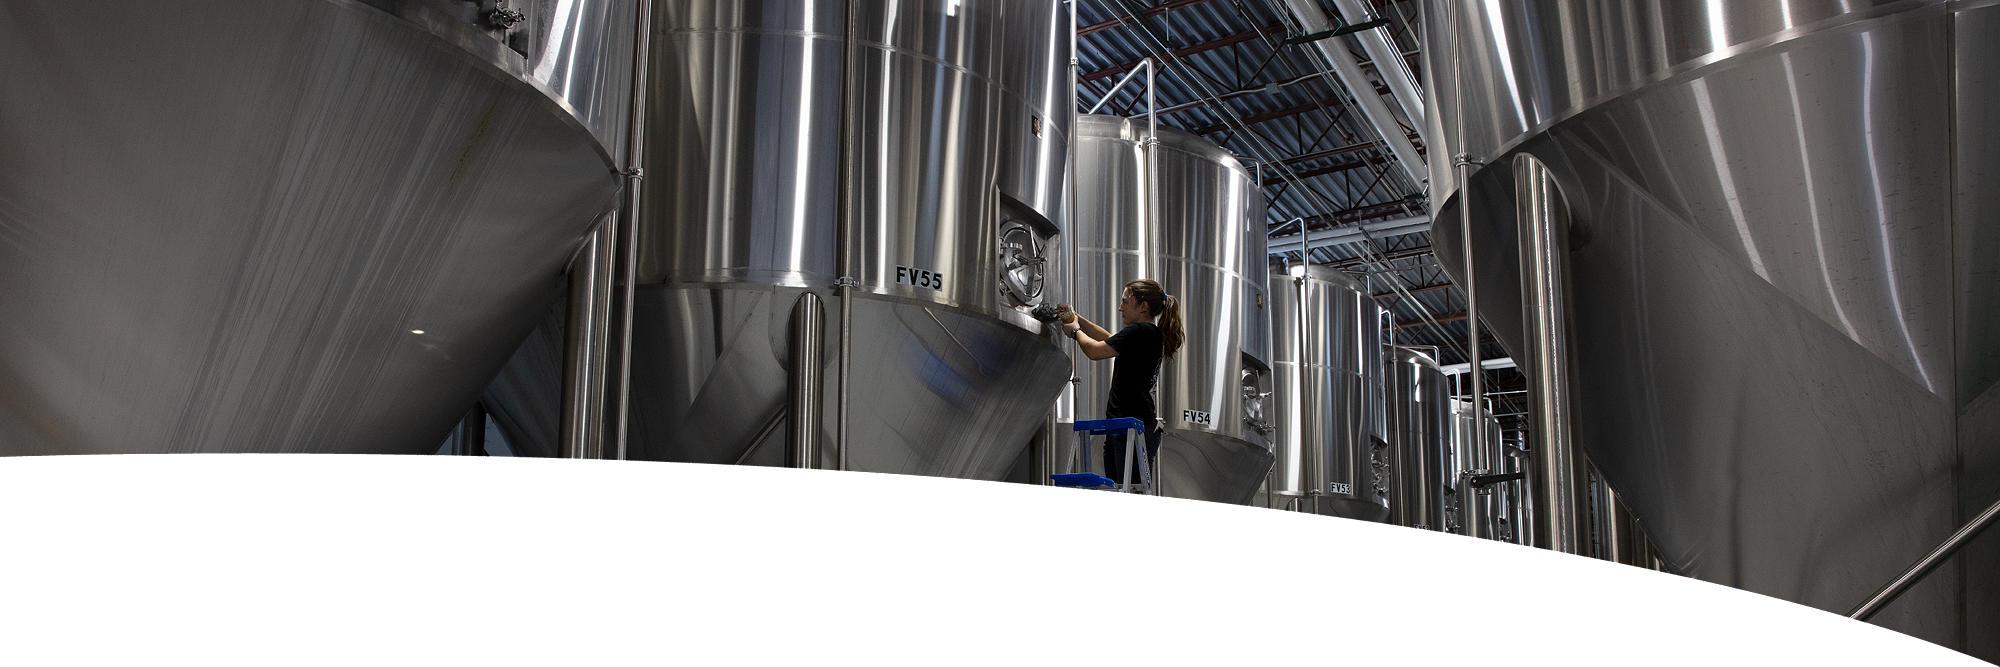 brewery-banner